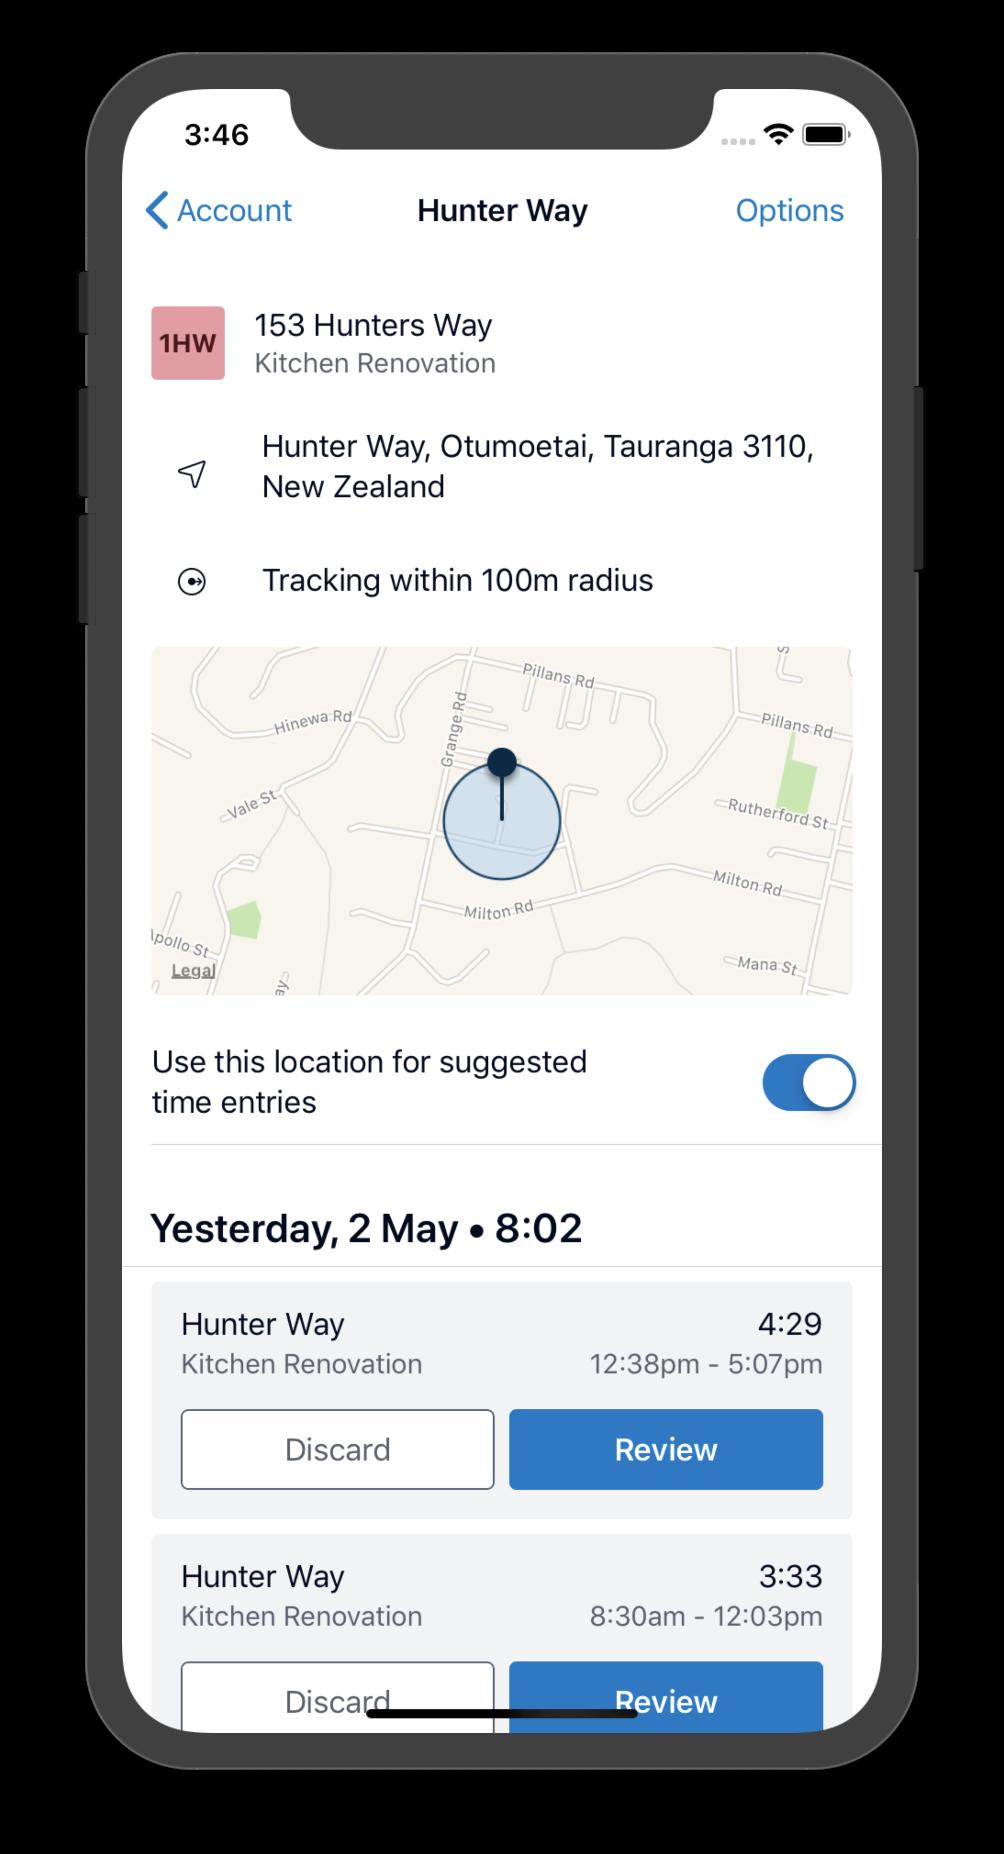 xero-location-settings-image